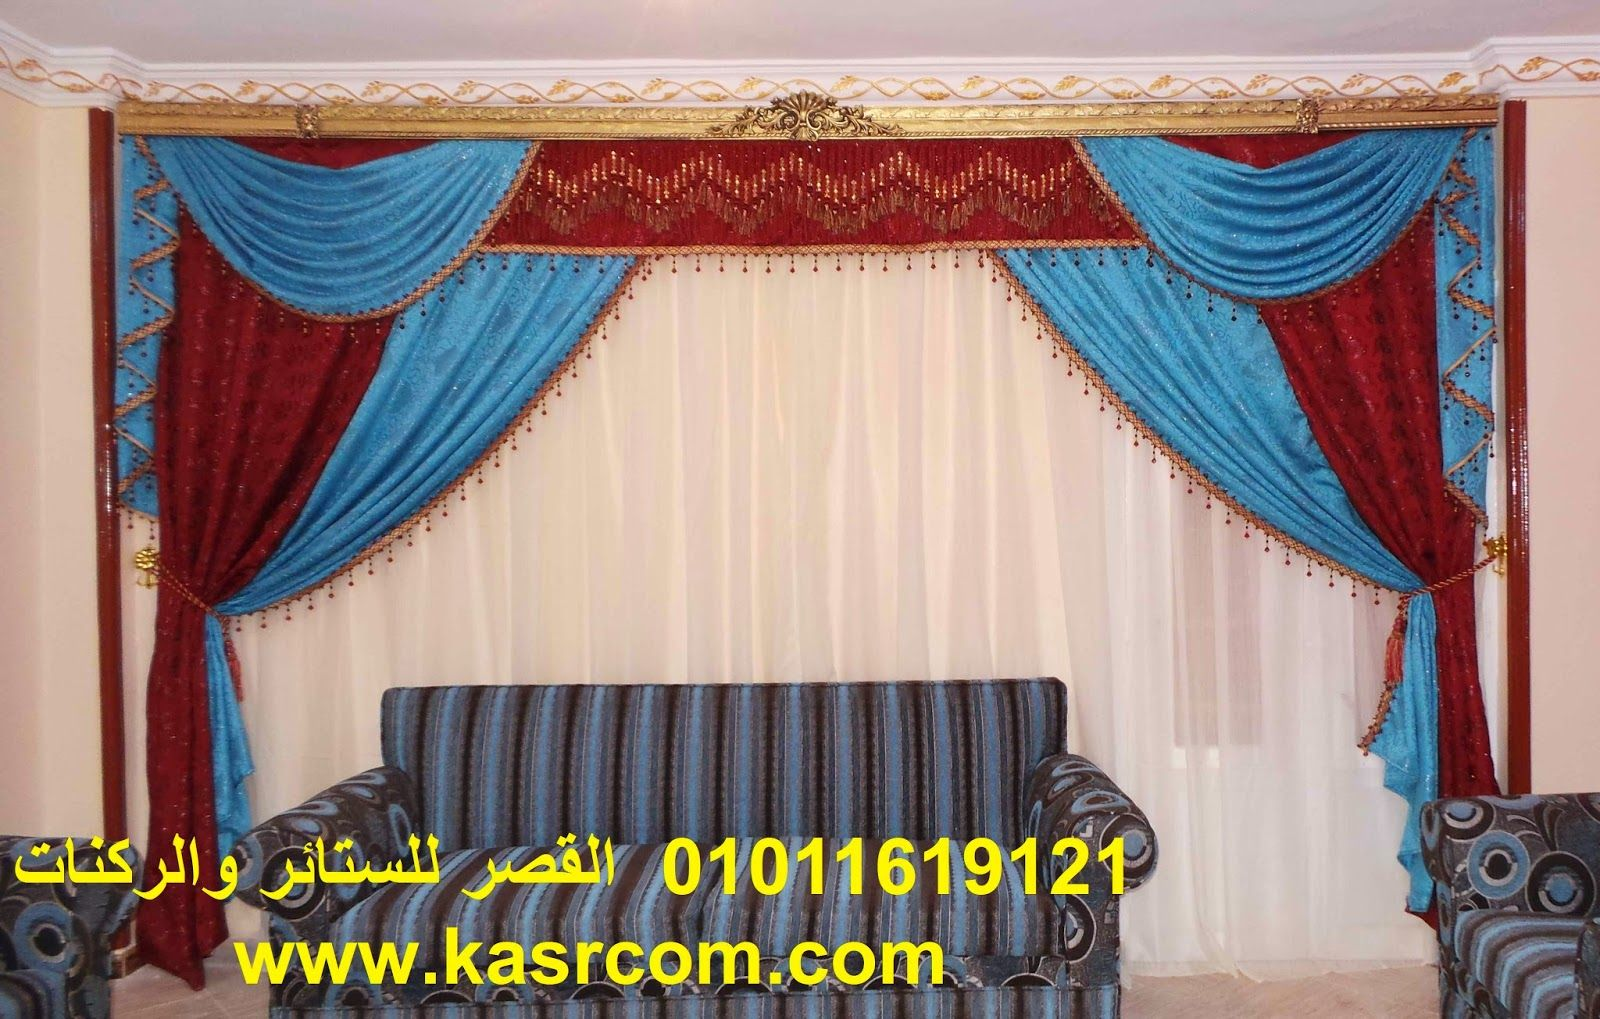 القصر للستائر والركنات Home Decor Decor Curtains